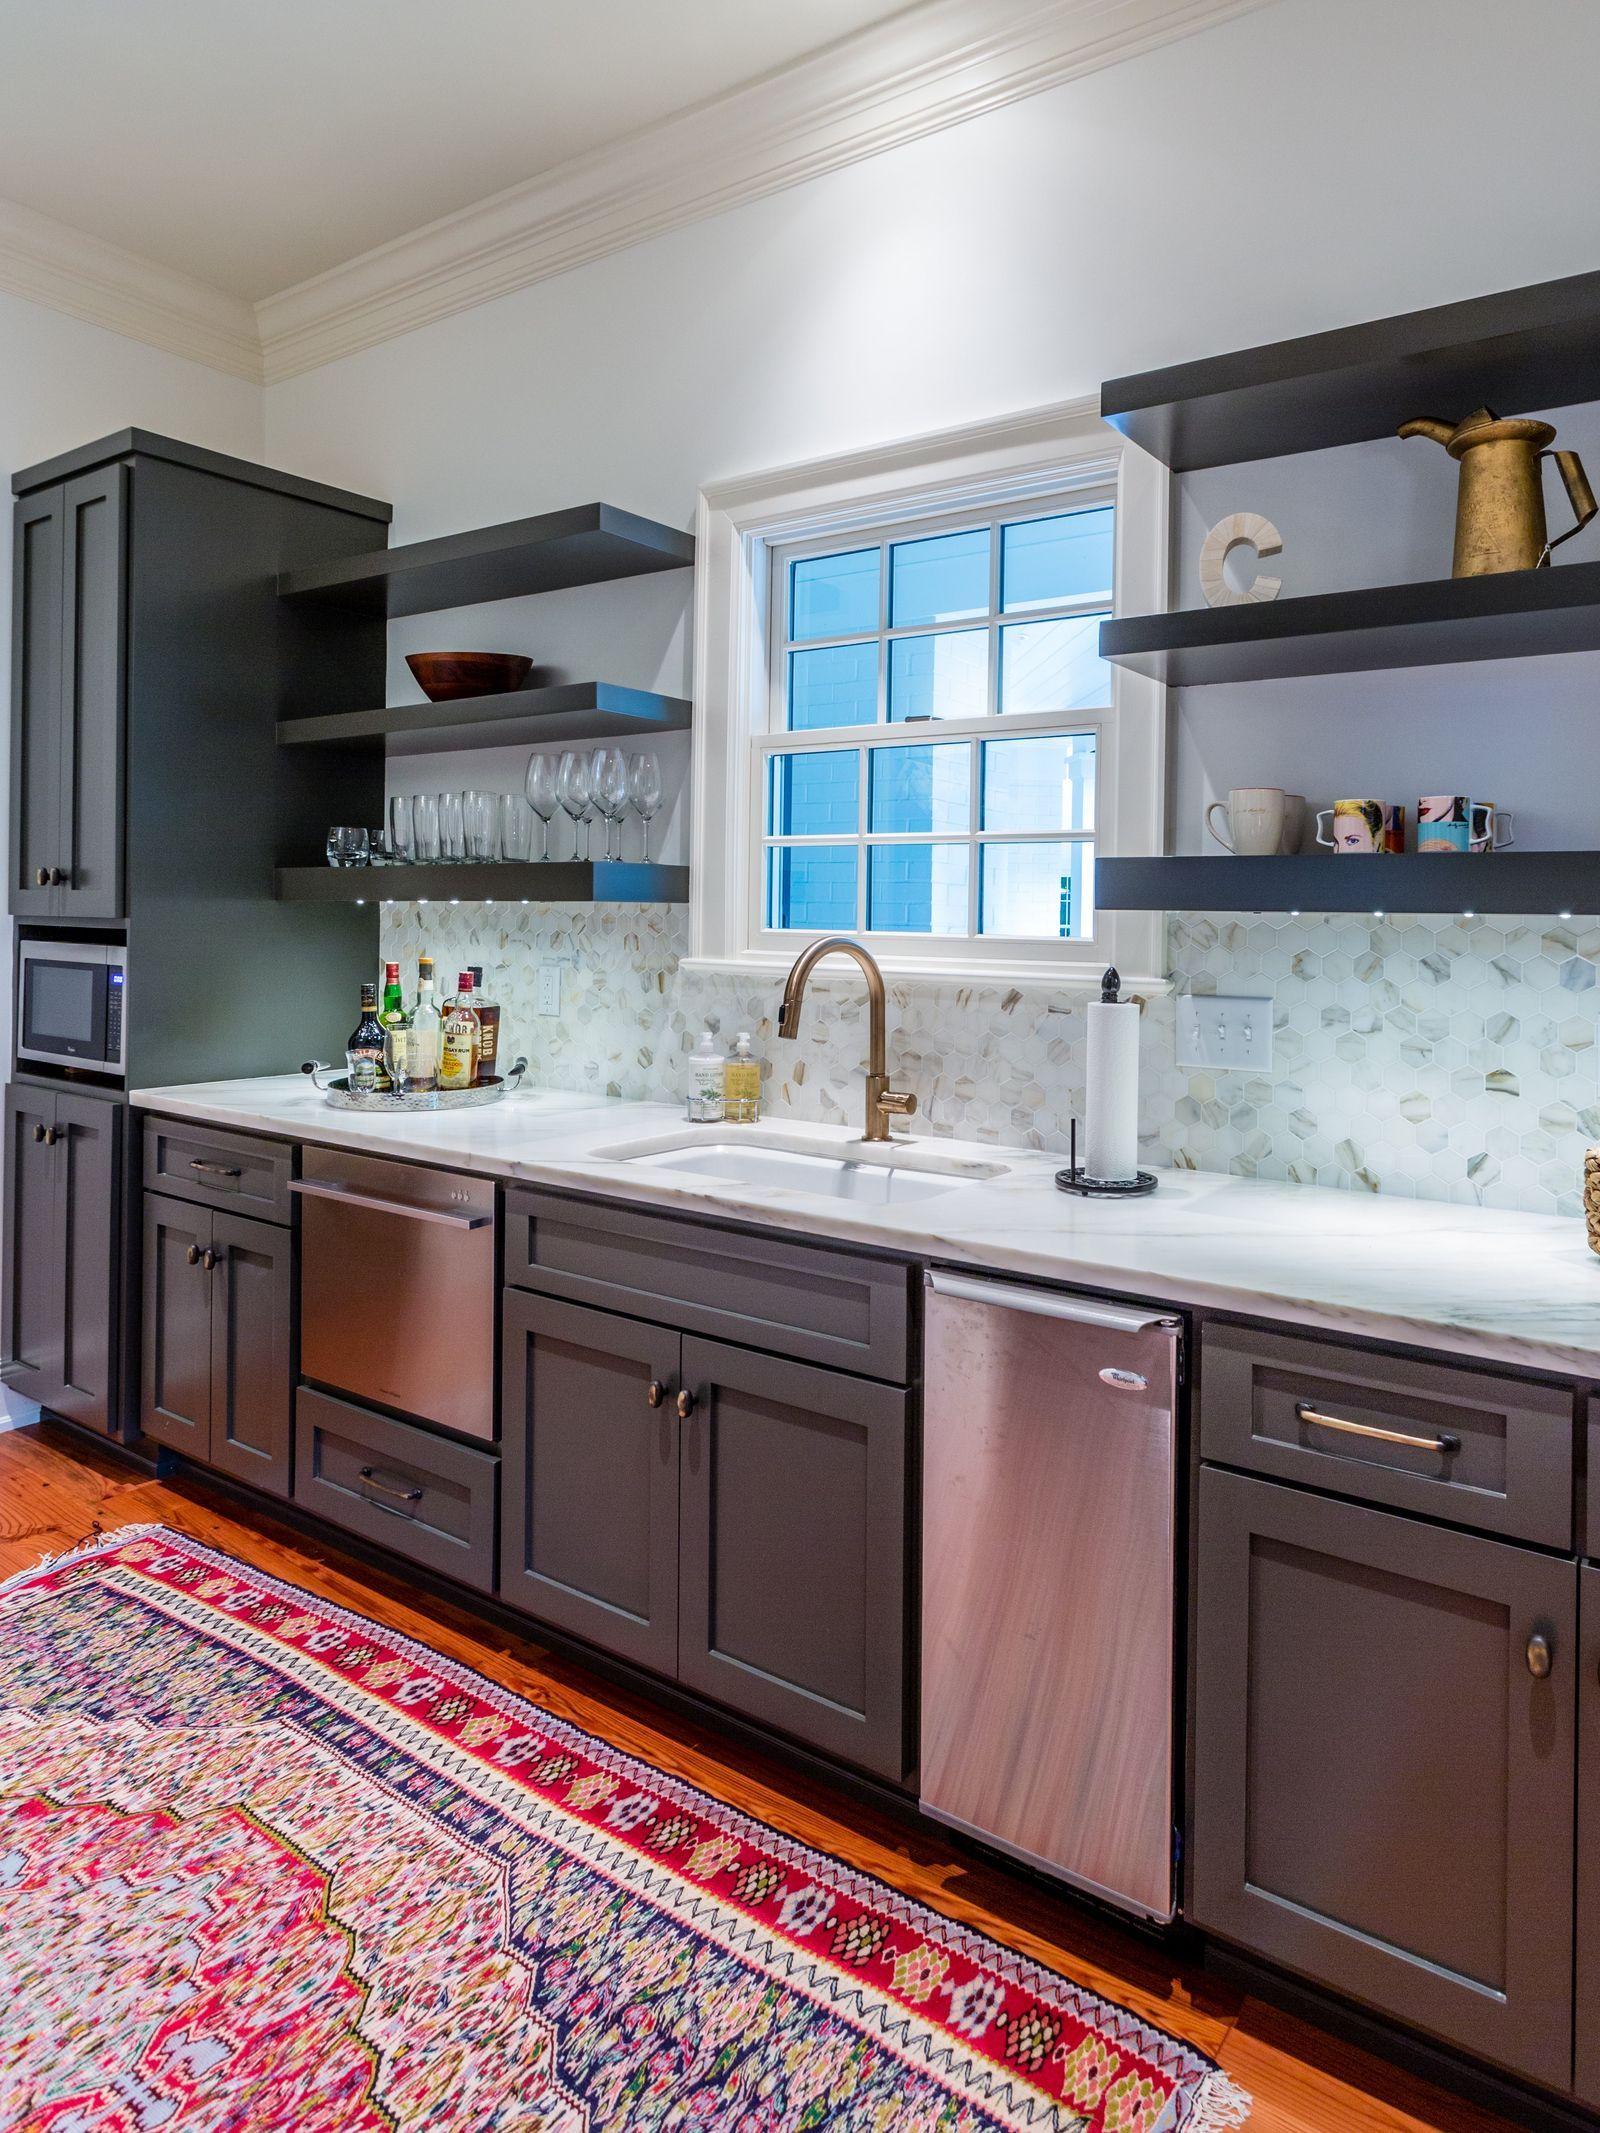 these cozy bohemian kitchens will inspire your next renovation cottage style kitchen interior on kitchen interior boho id=17290